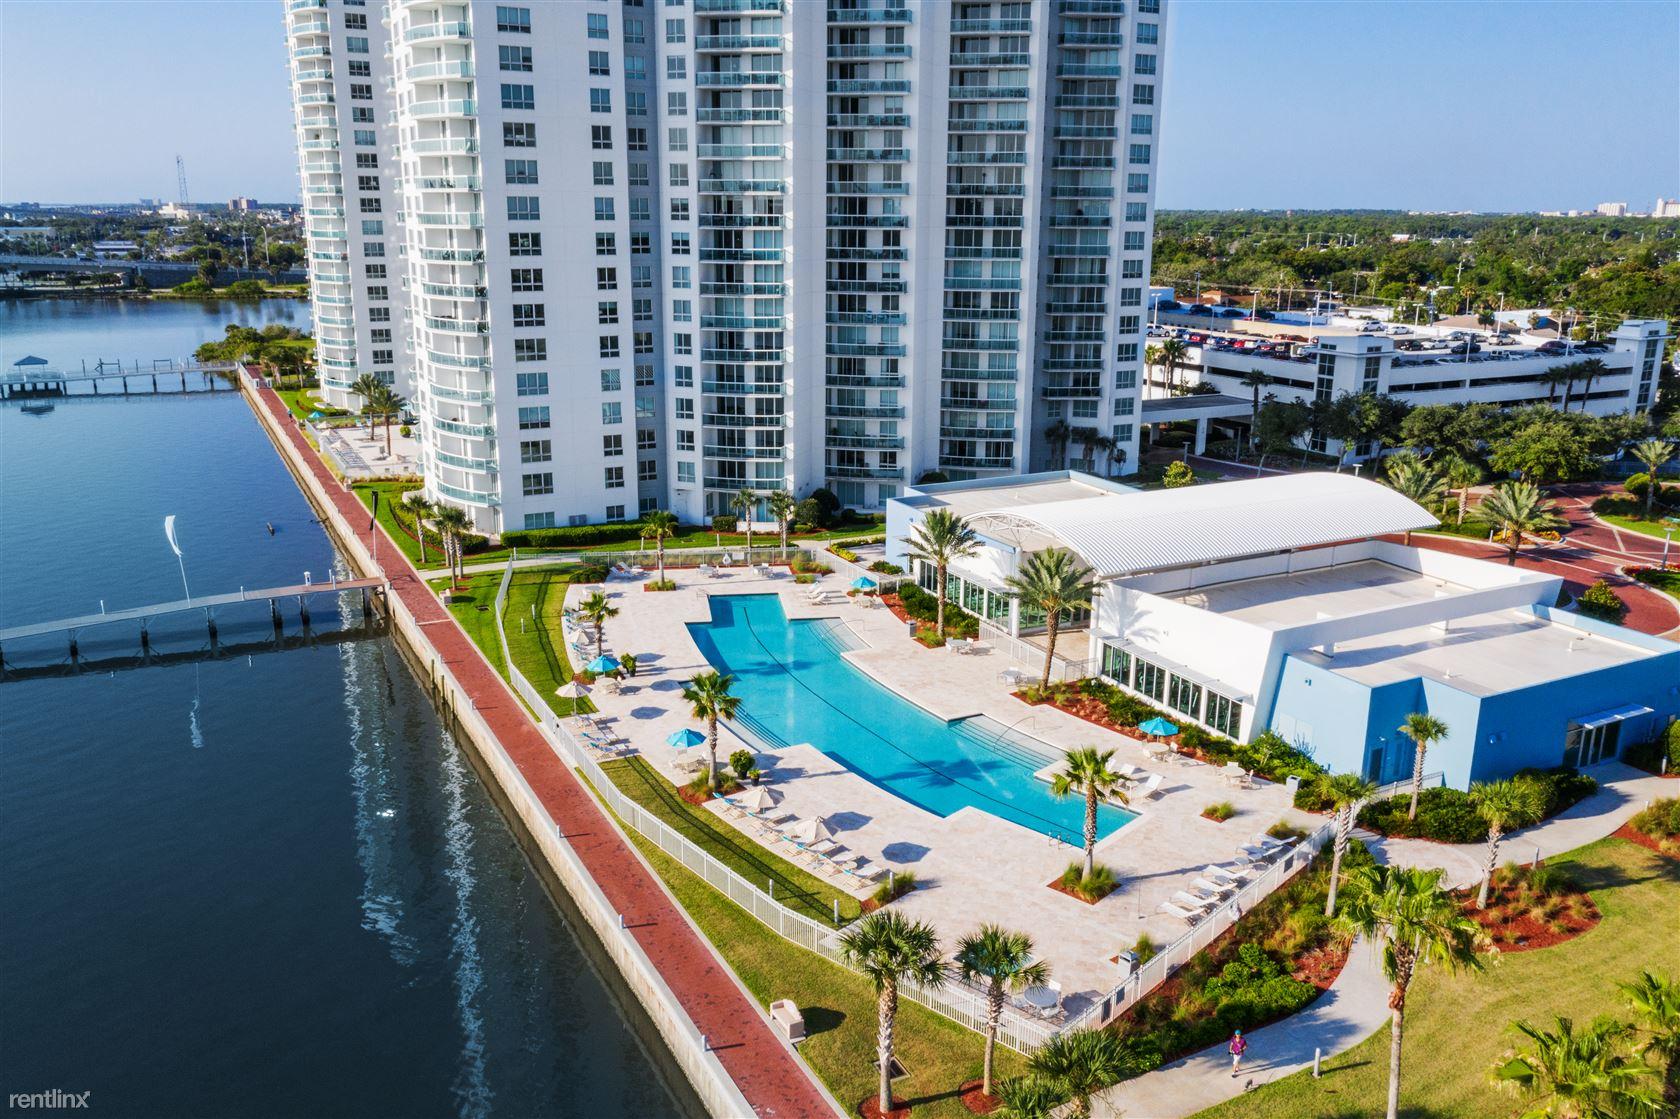 241 Riverside Dr Unit 307, Holly Hill, FL - $1,950